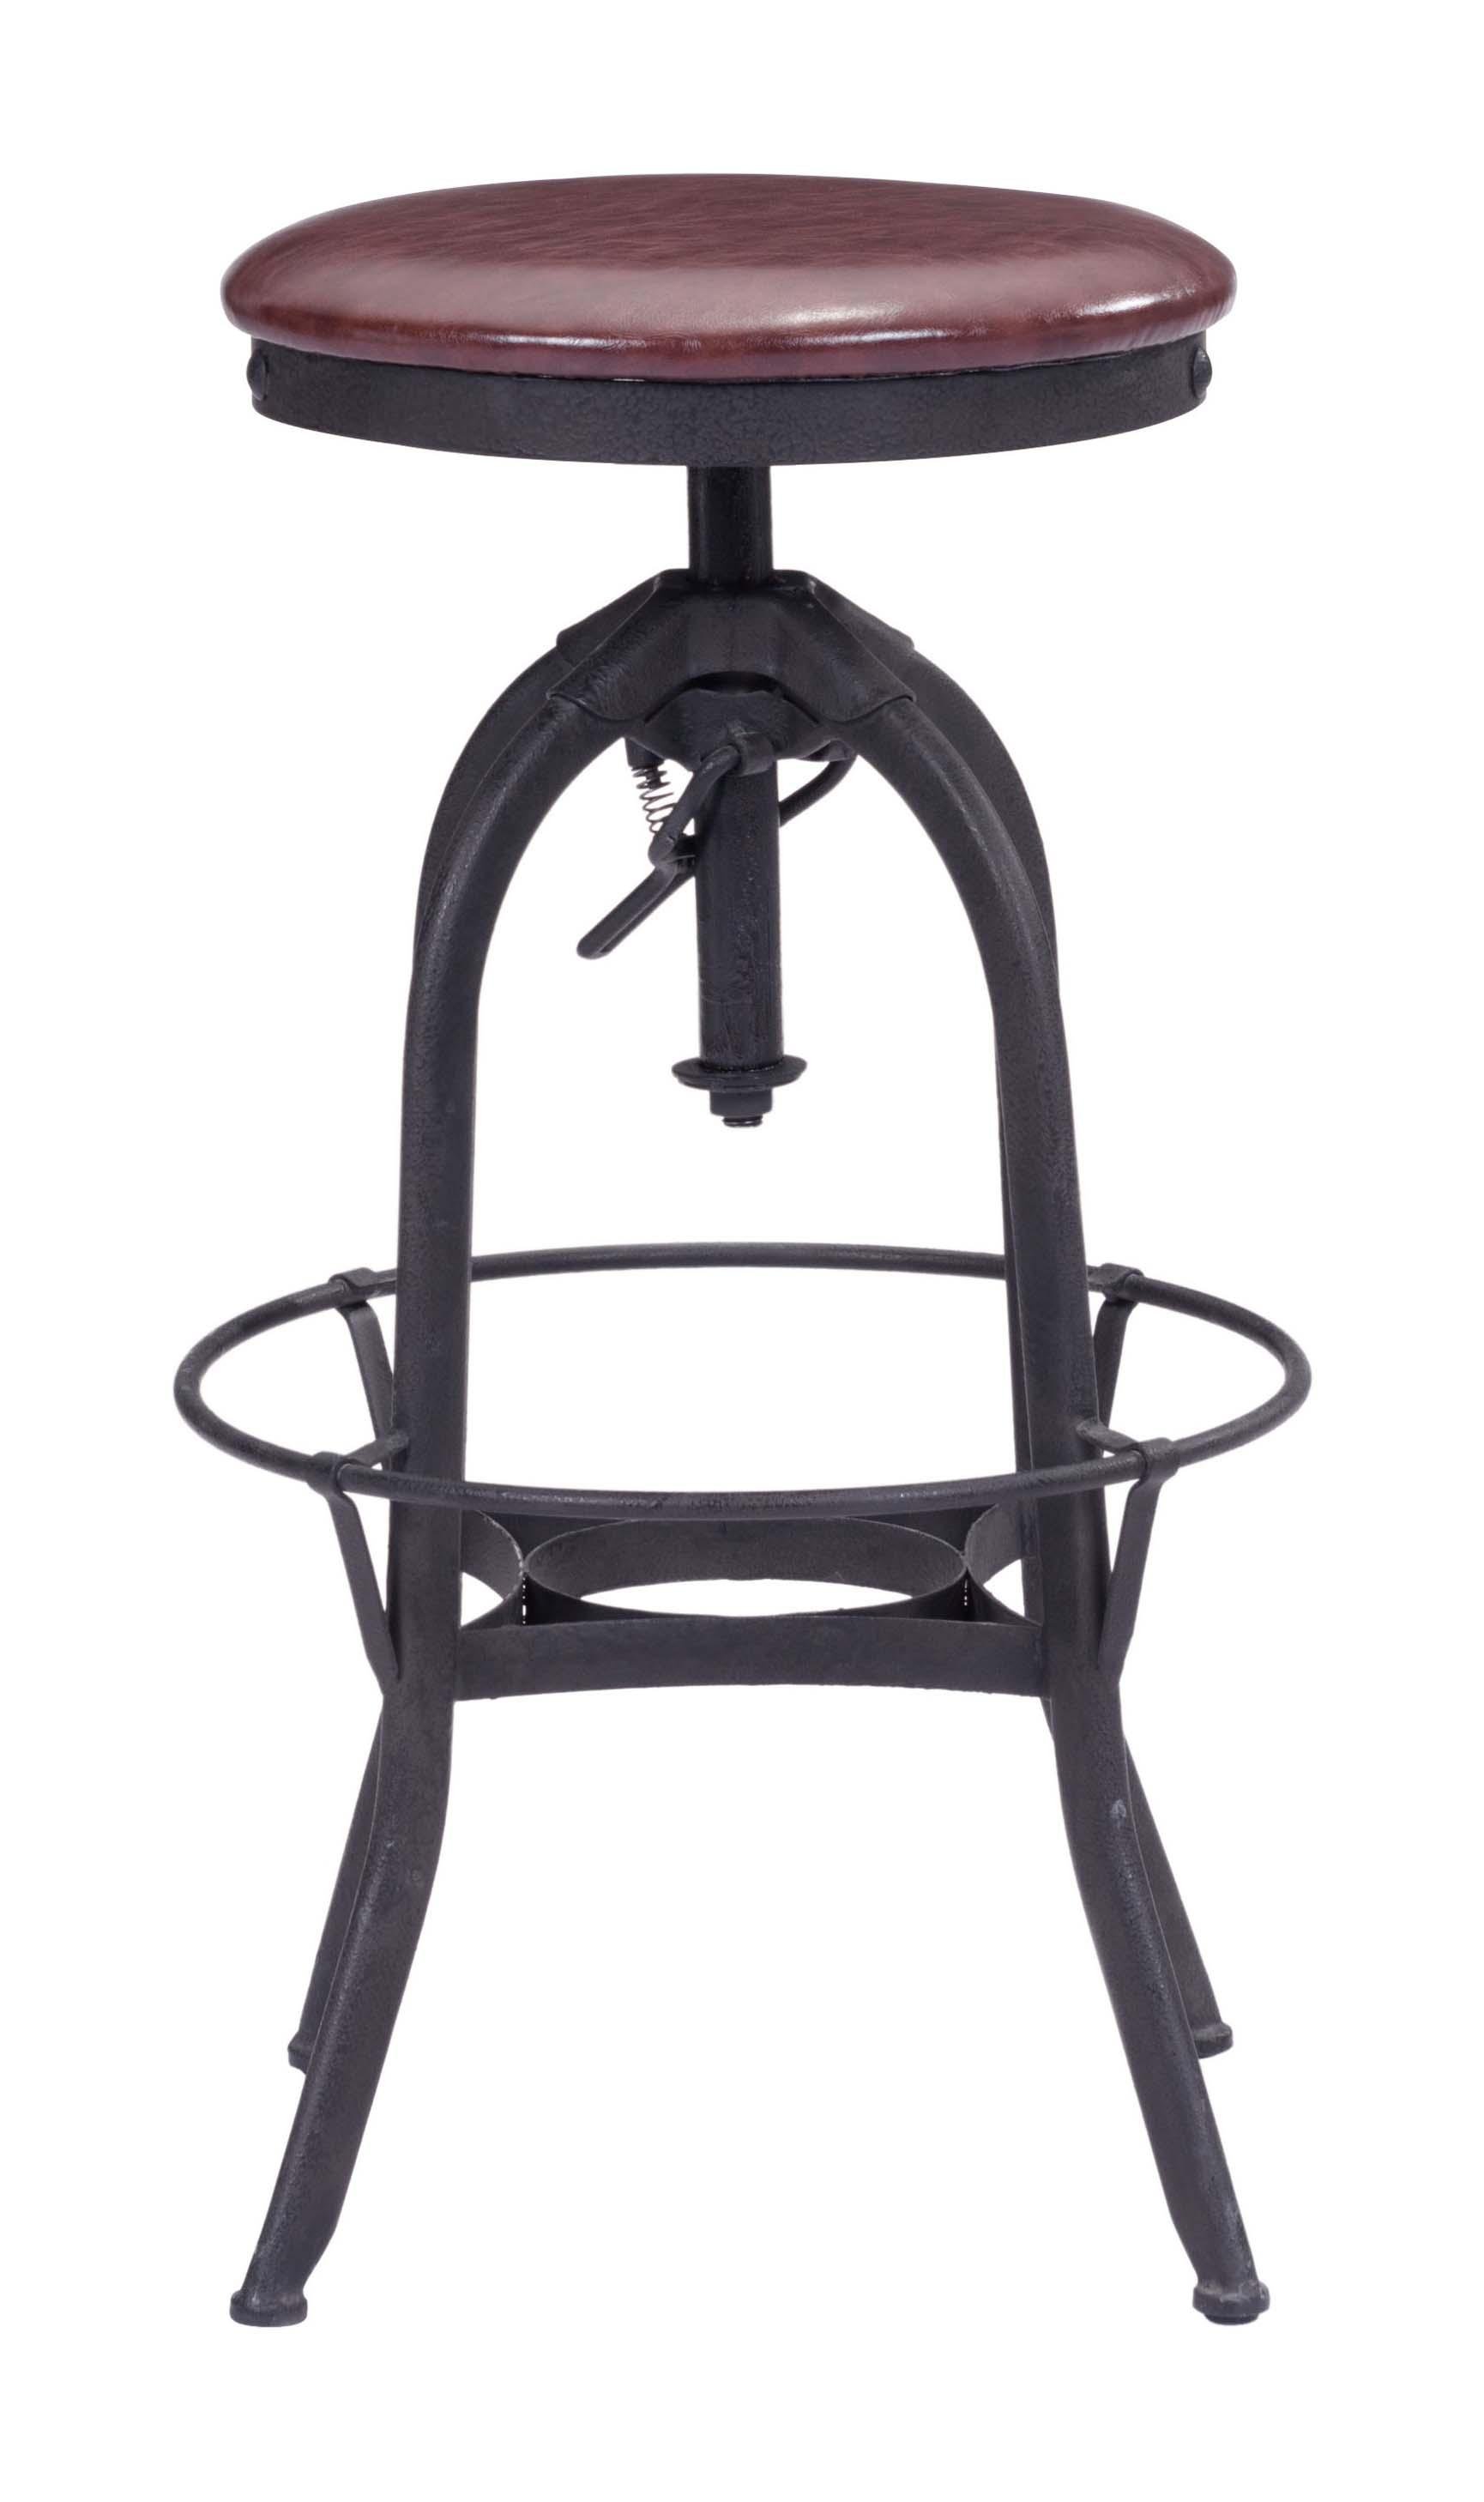 zuo-100441-crete-barstool-burgundy-black.jpg